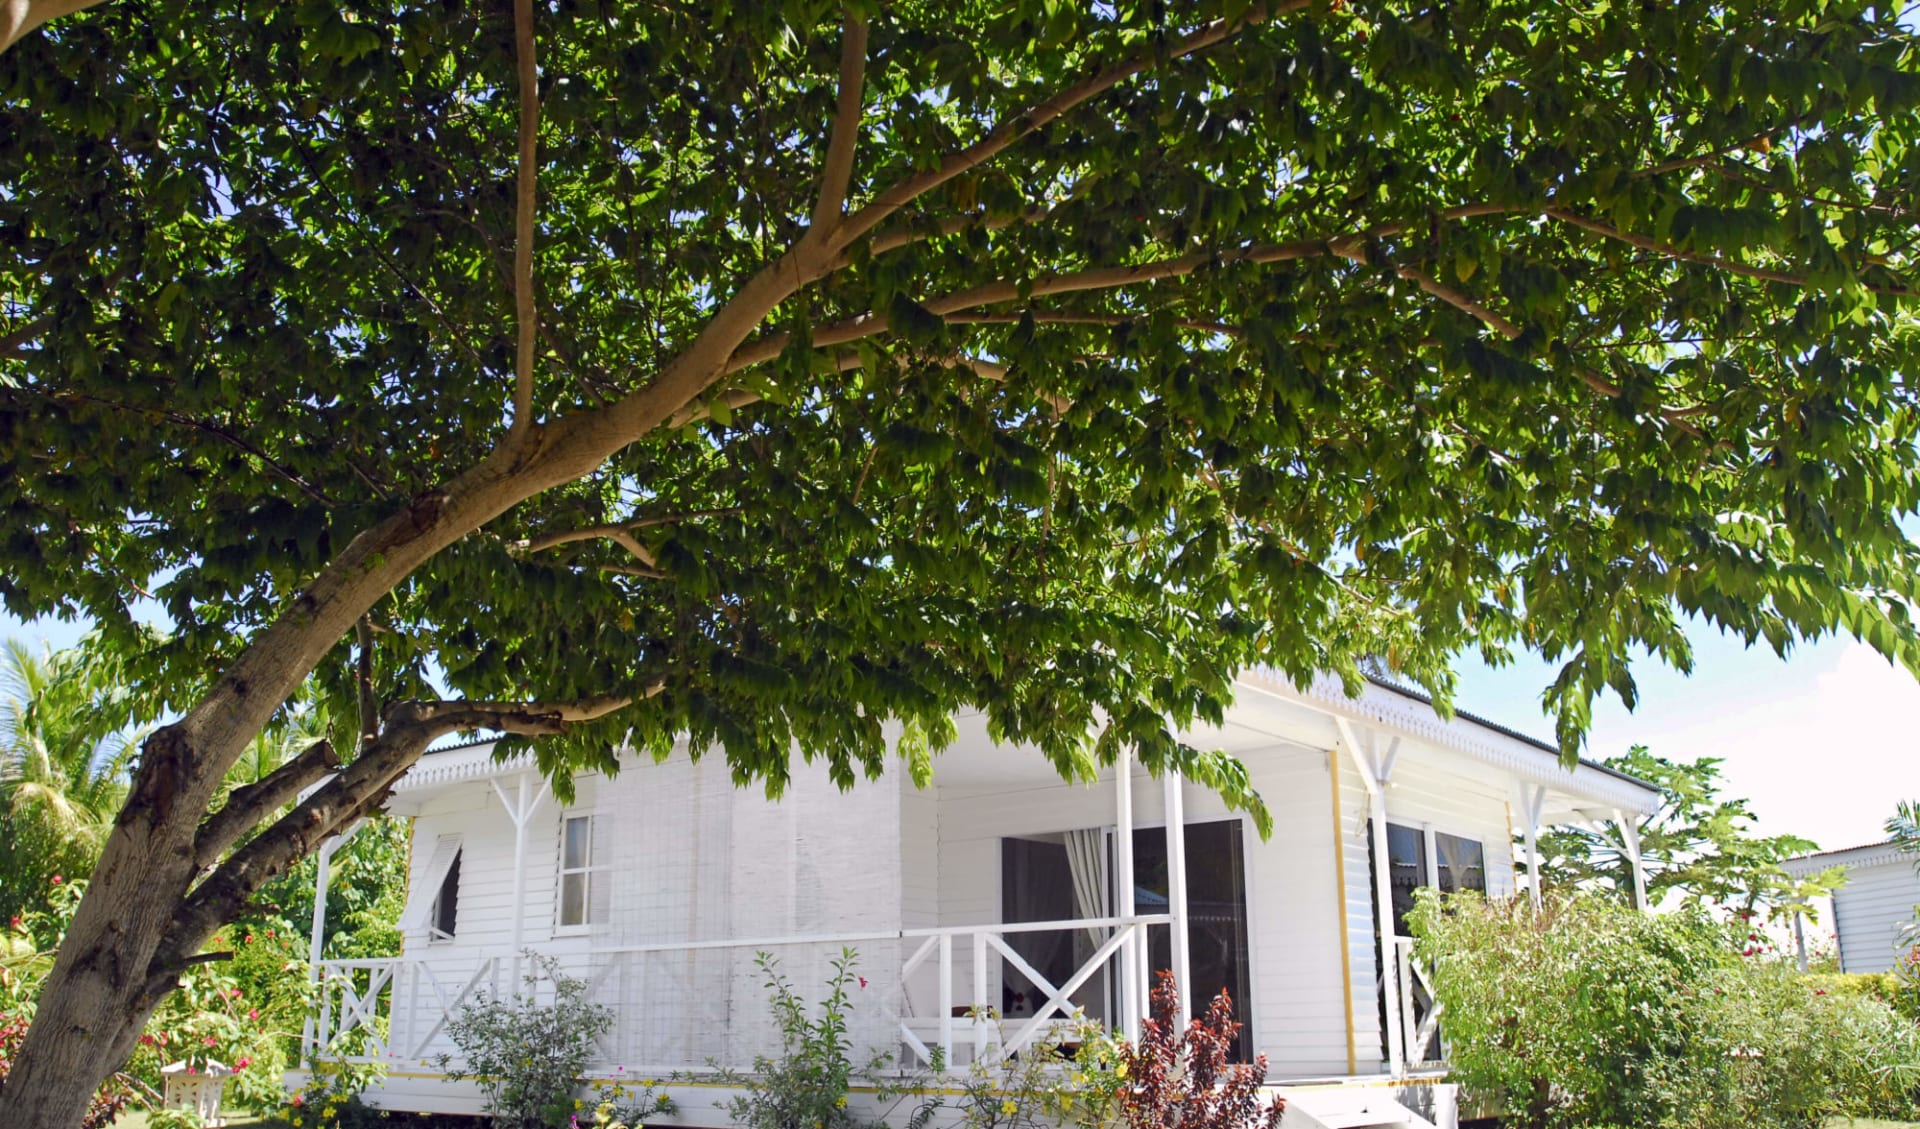 Hôtel Opoa Beach in Raiatea:  RFP Htl Opoa Beach Bungalows 45